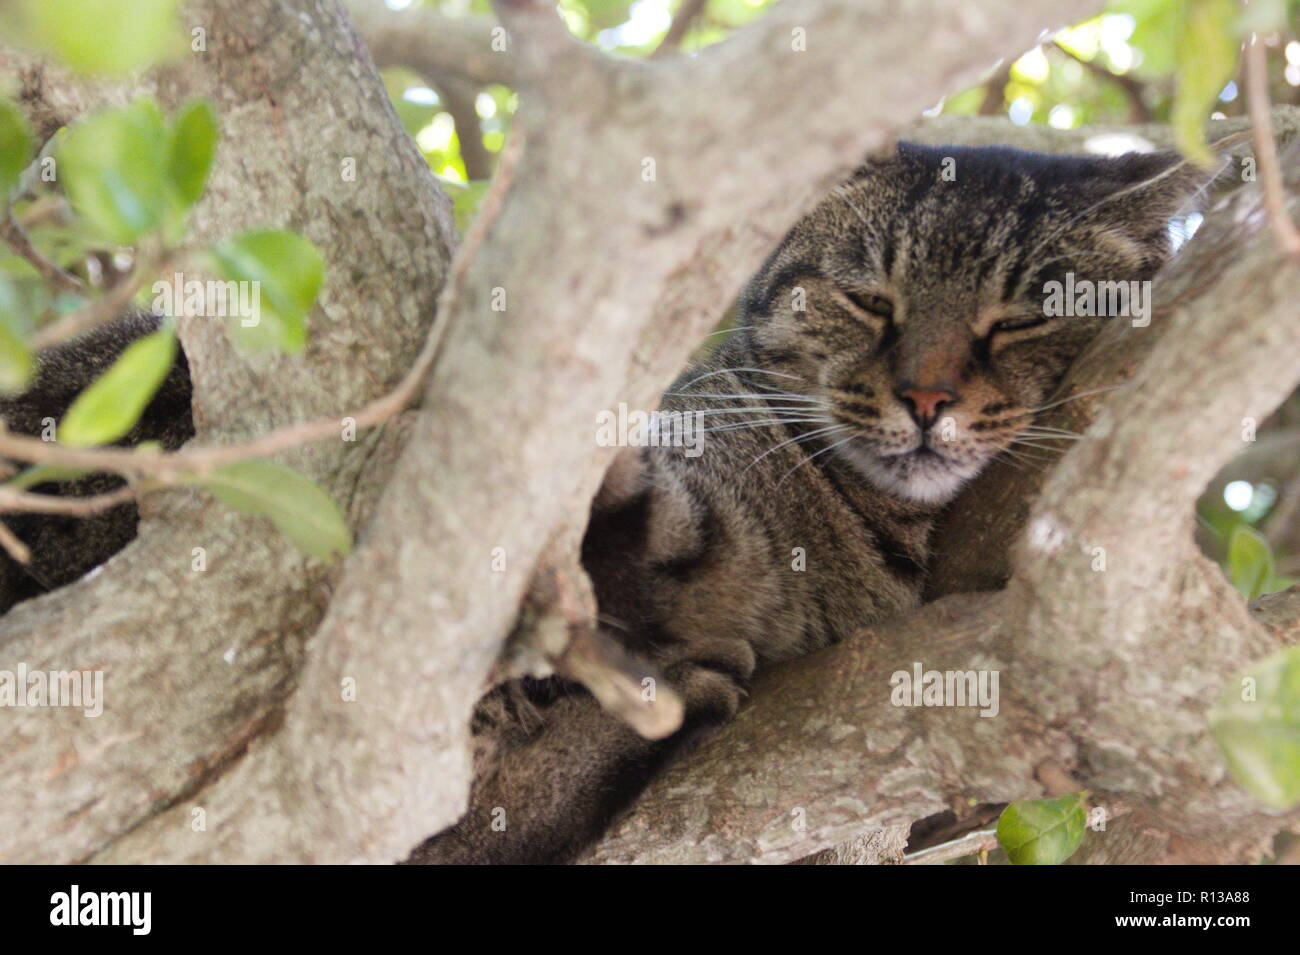 Cat Relaxing in Tree in San Anton Garden, Malta 7. November 2018 - Stock Image